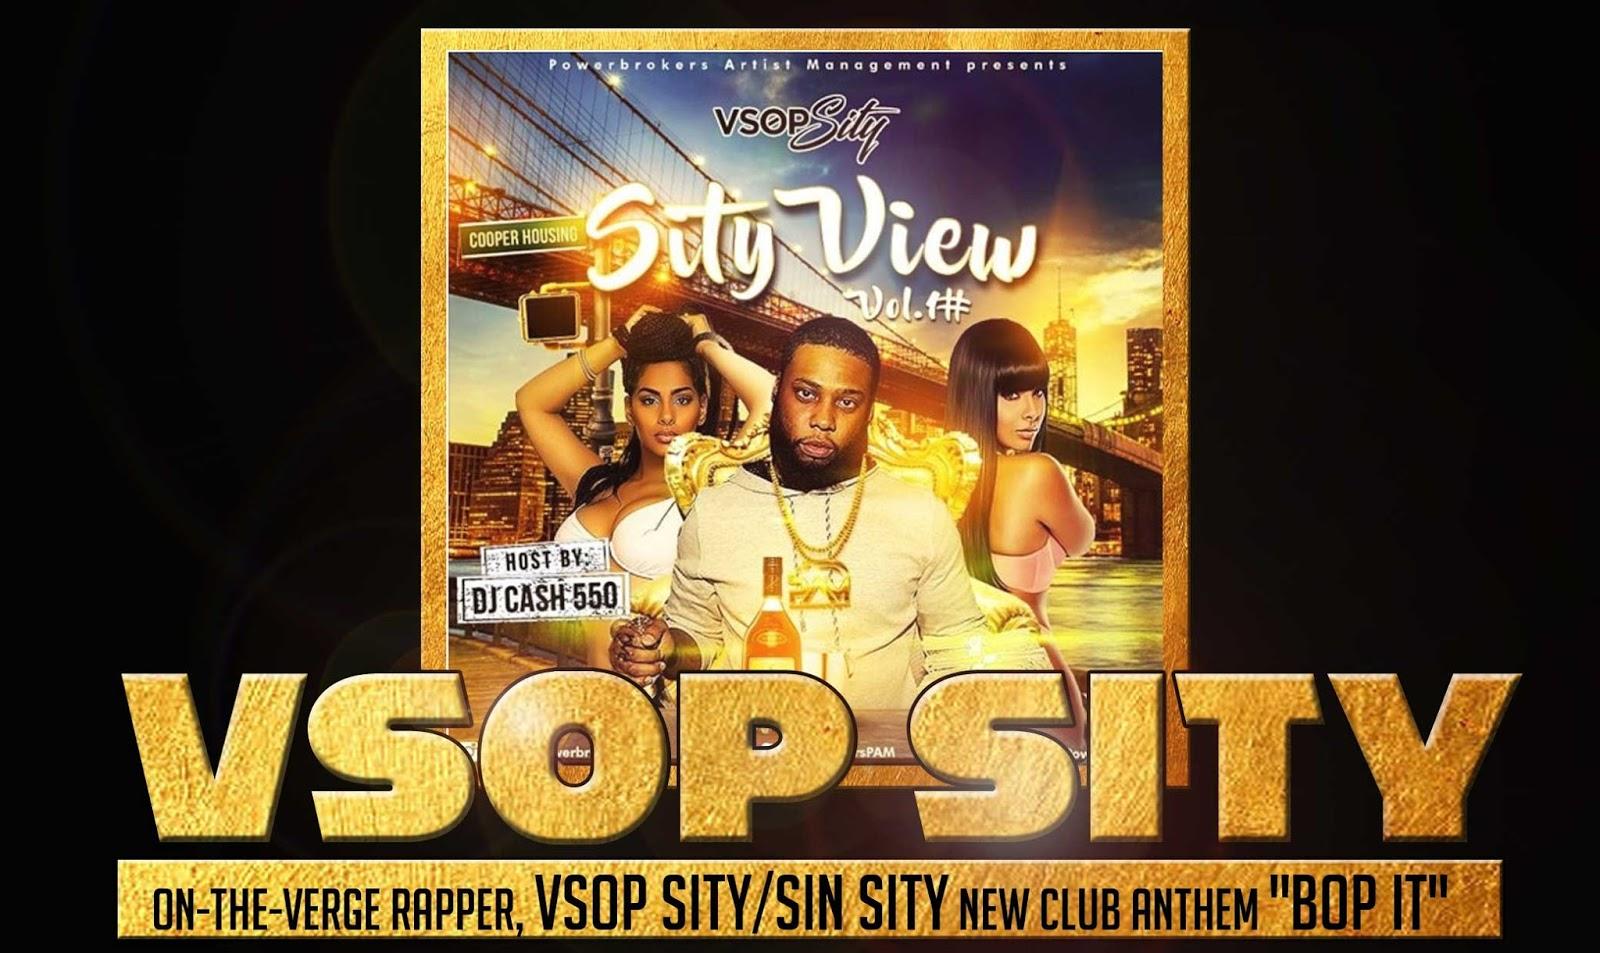 NYC HIPHOP>> On-The-Verge rapper, VSOP Sity/Sin Sity new